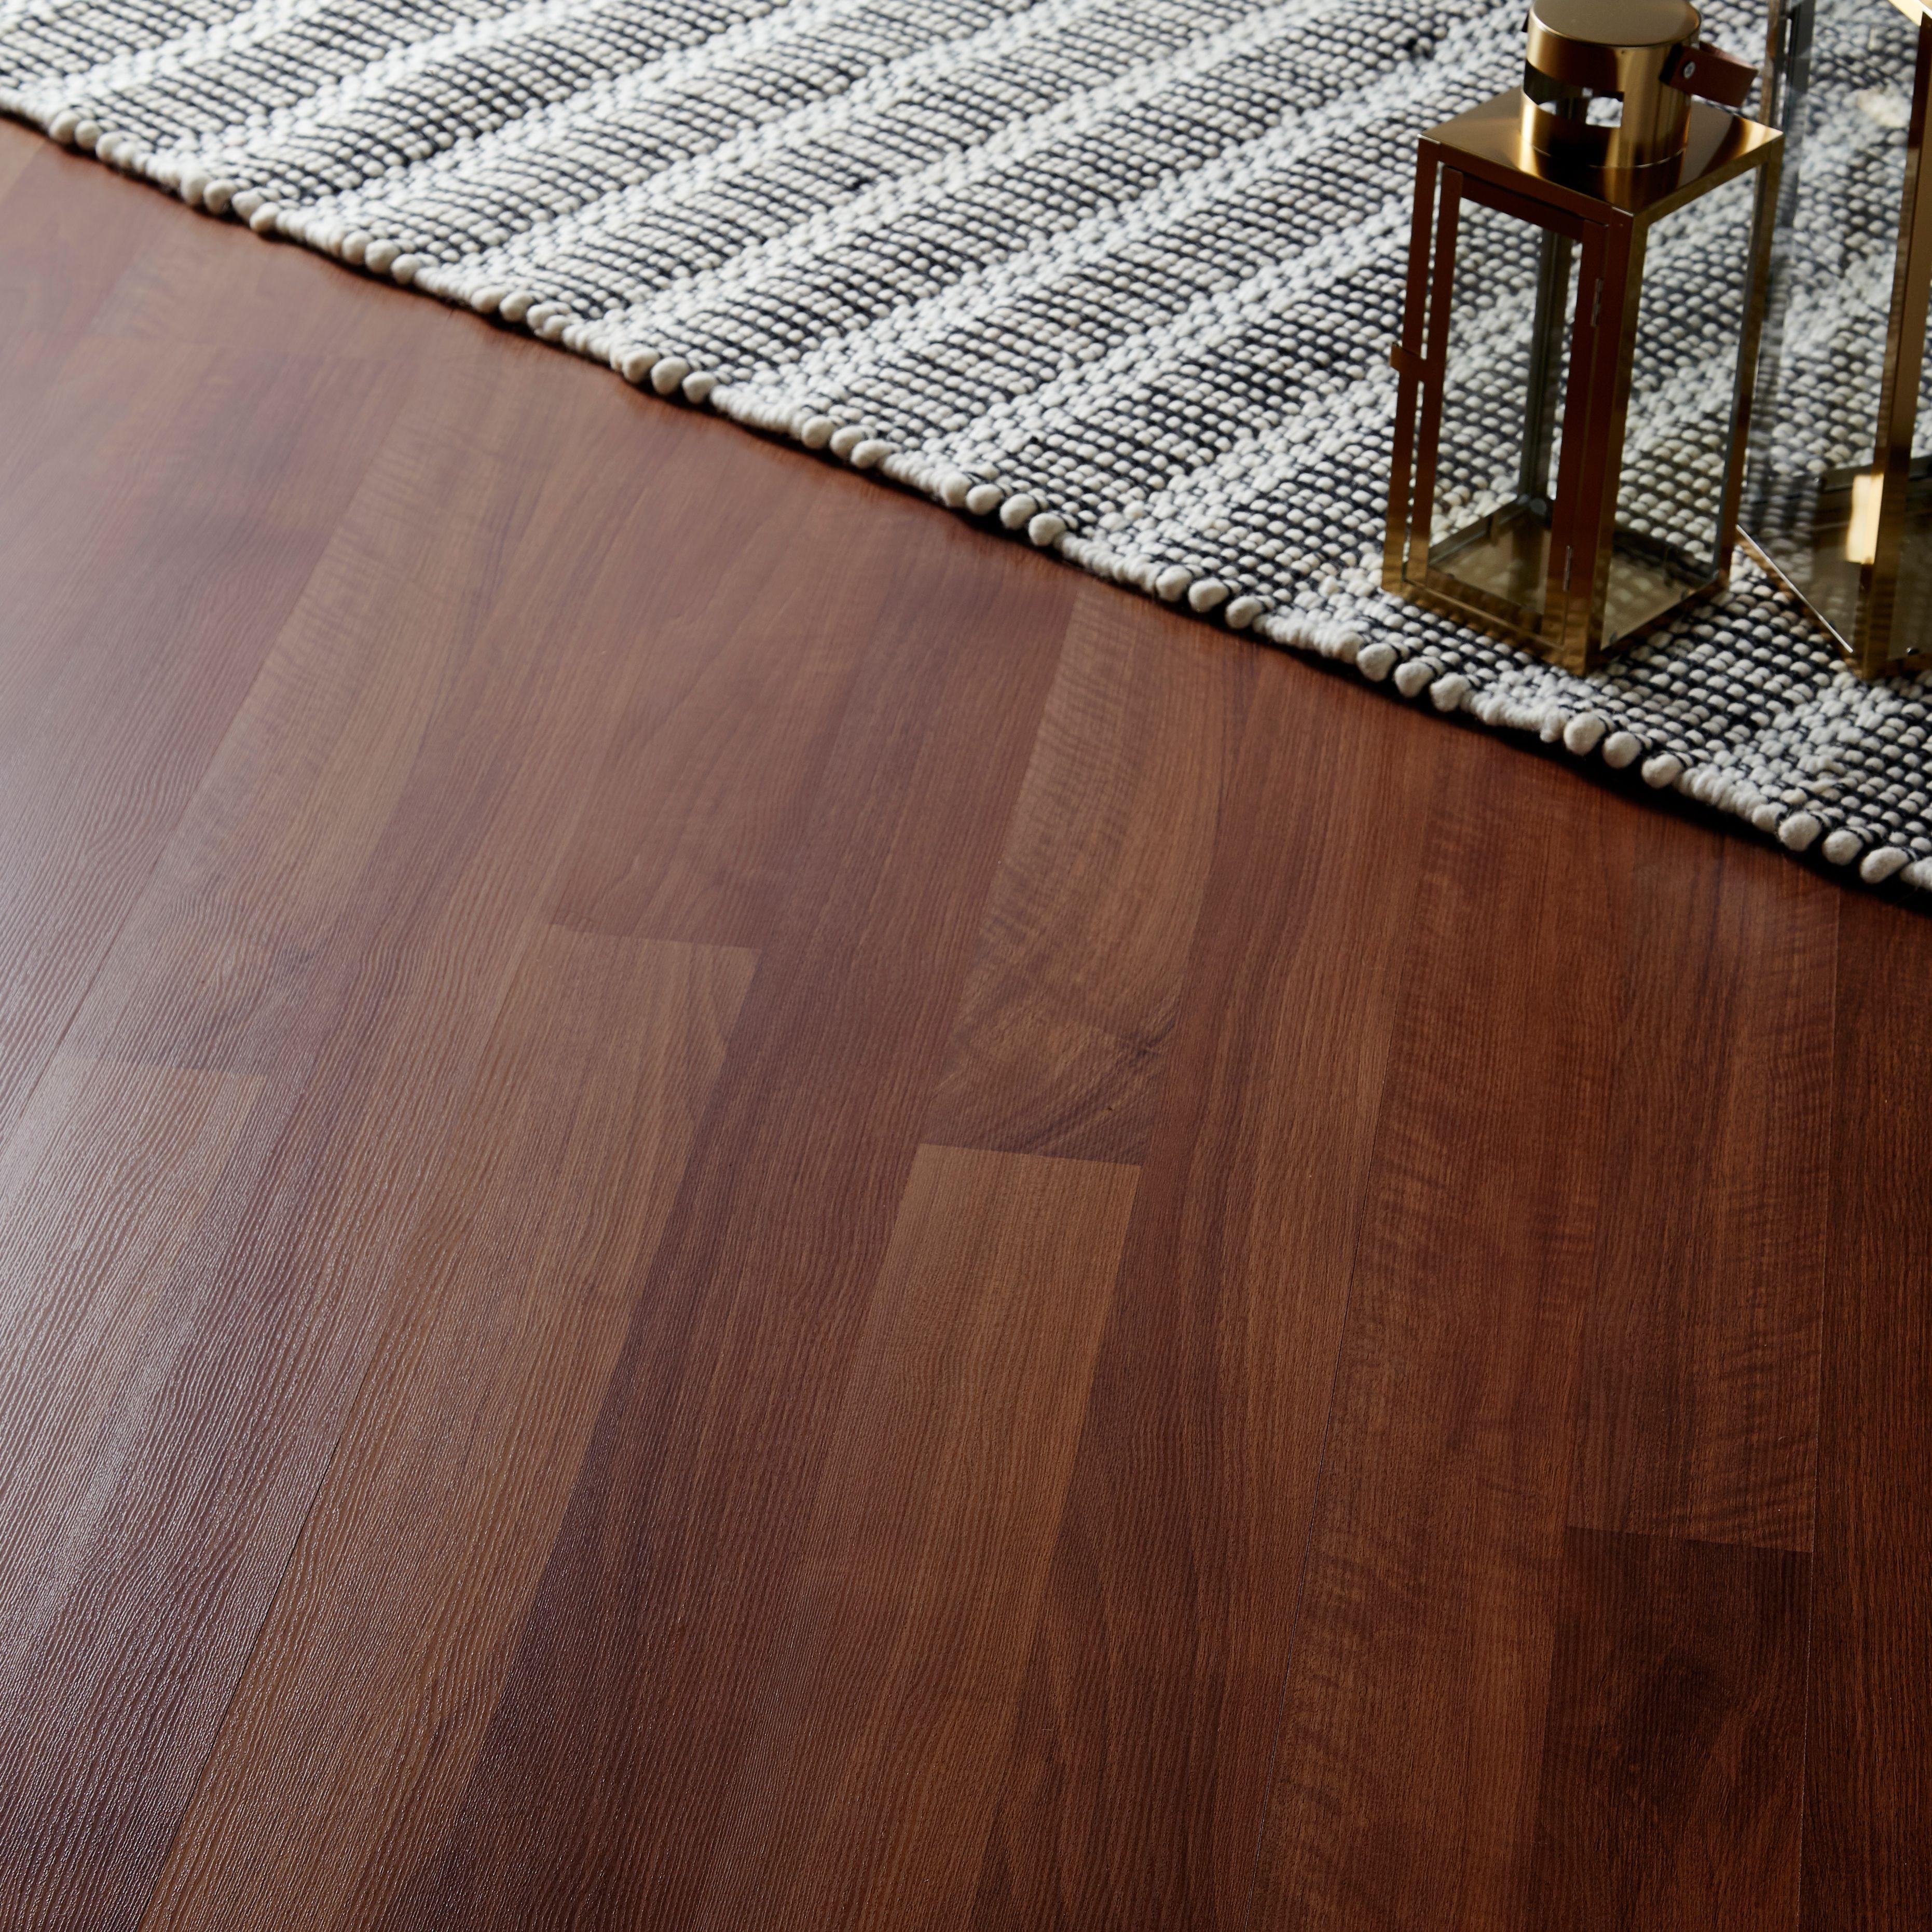 Geraldton Dark Walnut effect Laminate flooring 2.467 m² Pack ...